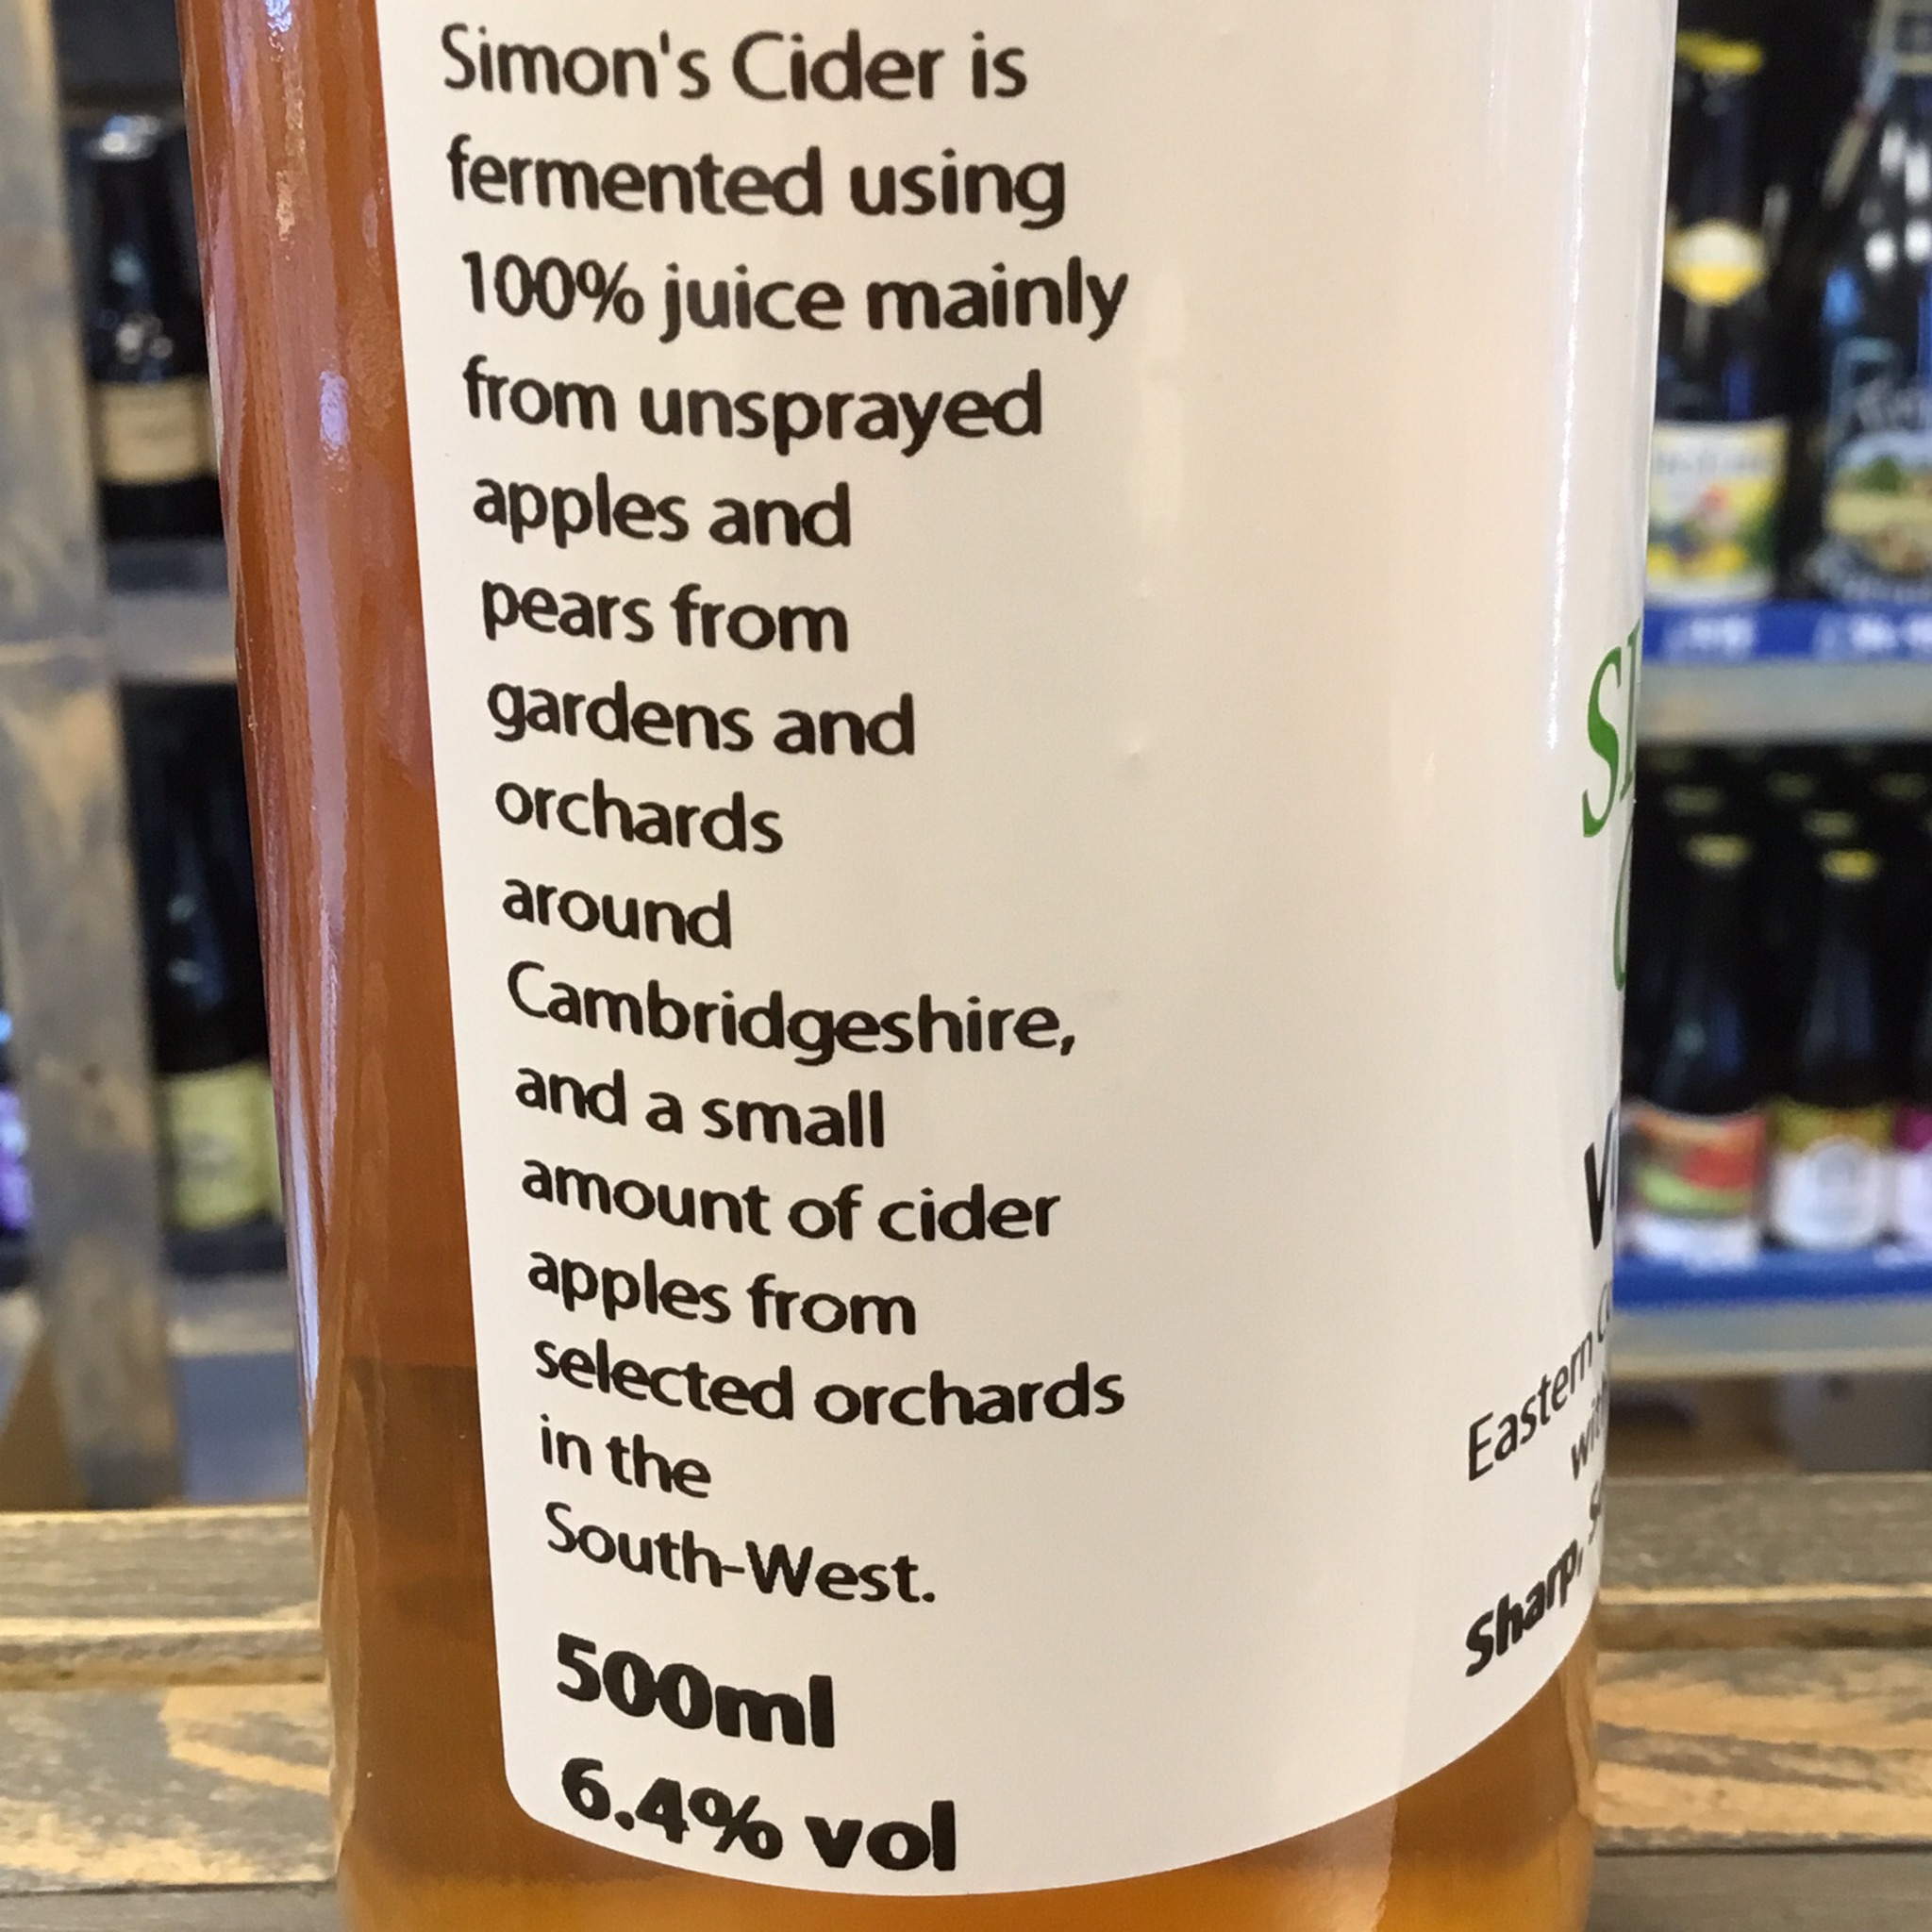 Vice Versa 6.4% 500ml Simon's Cider